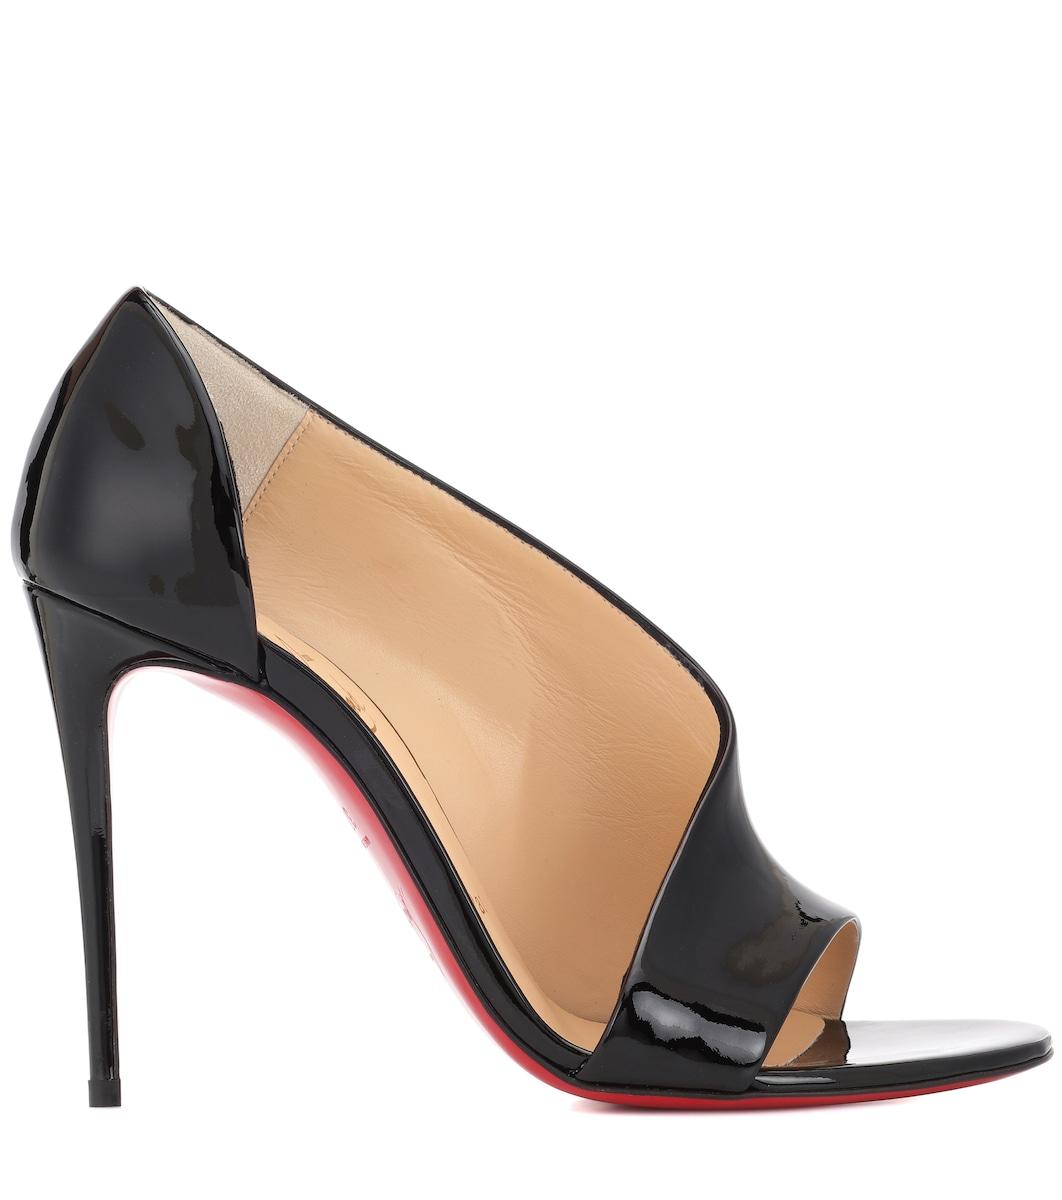 8afa2d4ab Phoebe 100 Patent Leather Sandals - Christian Louboutin | mytheresa